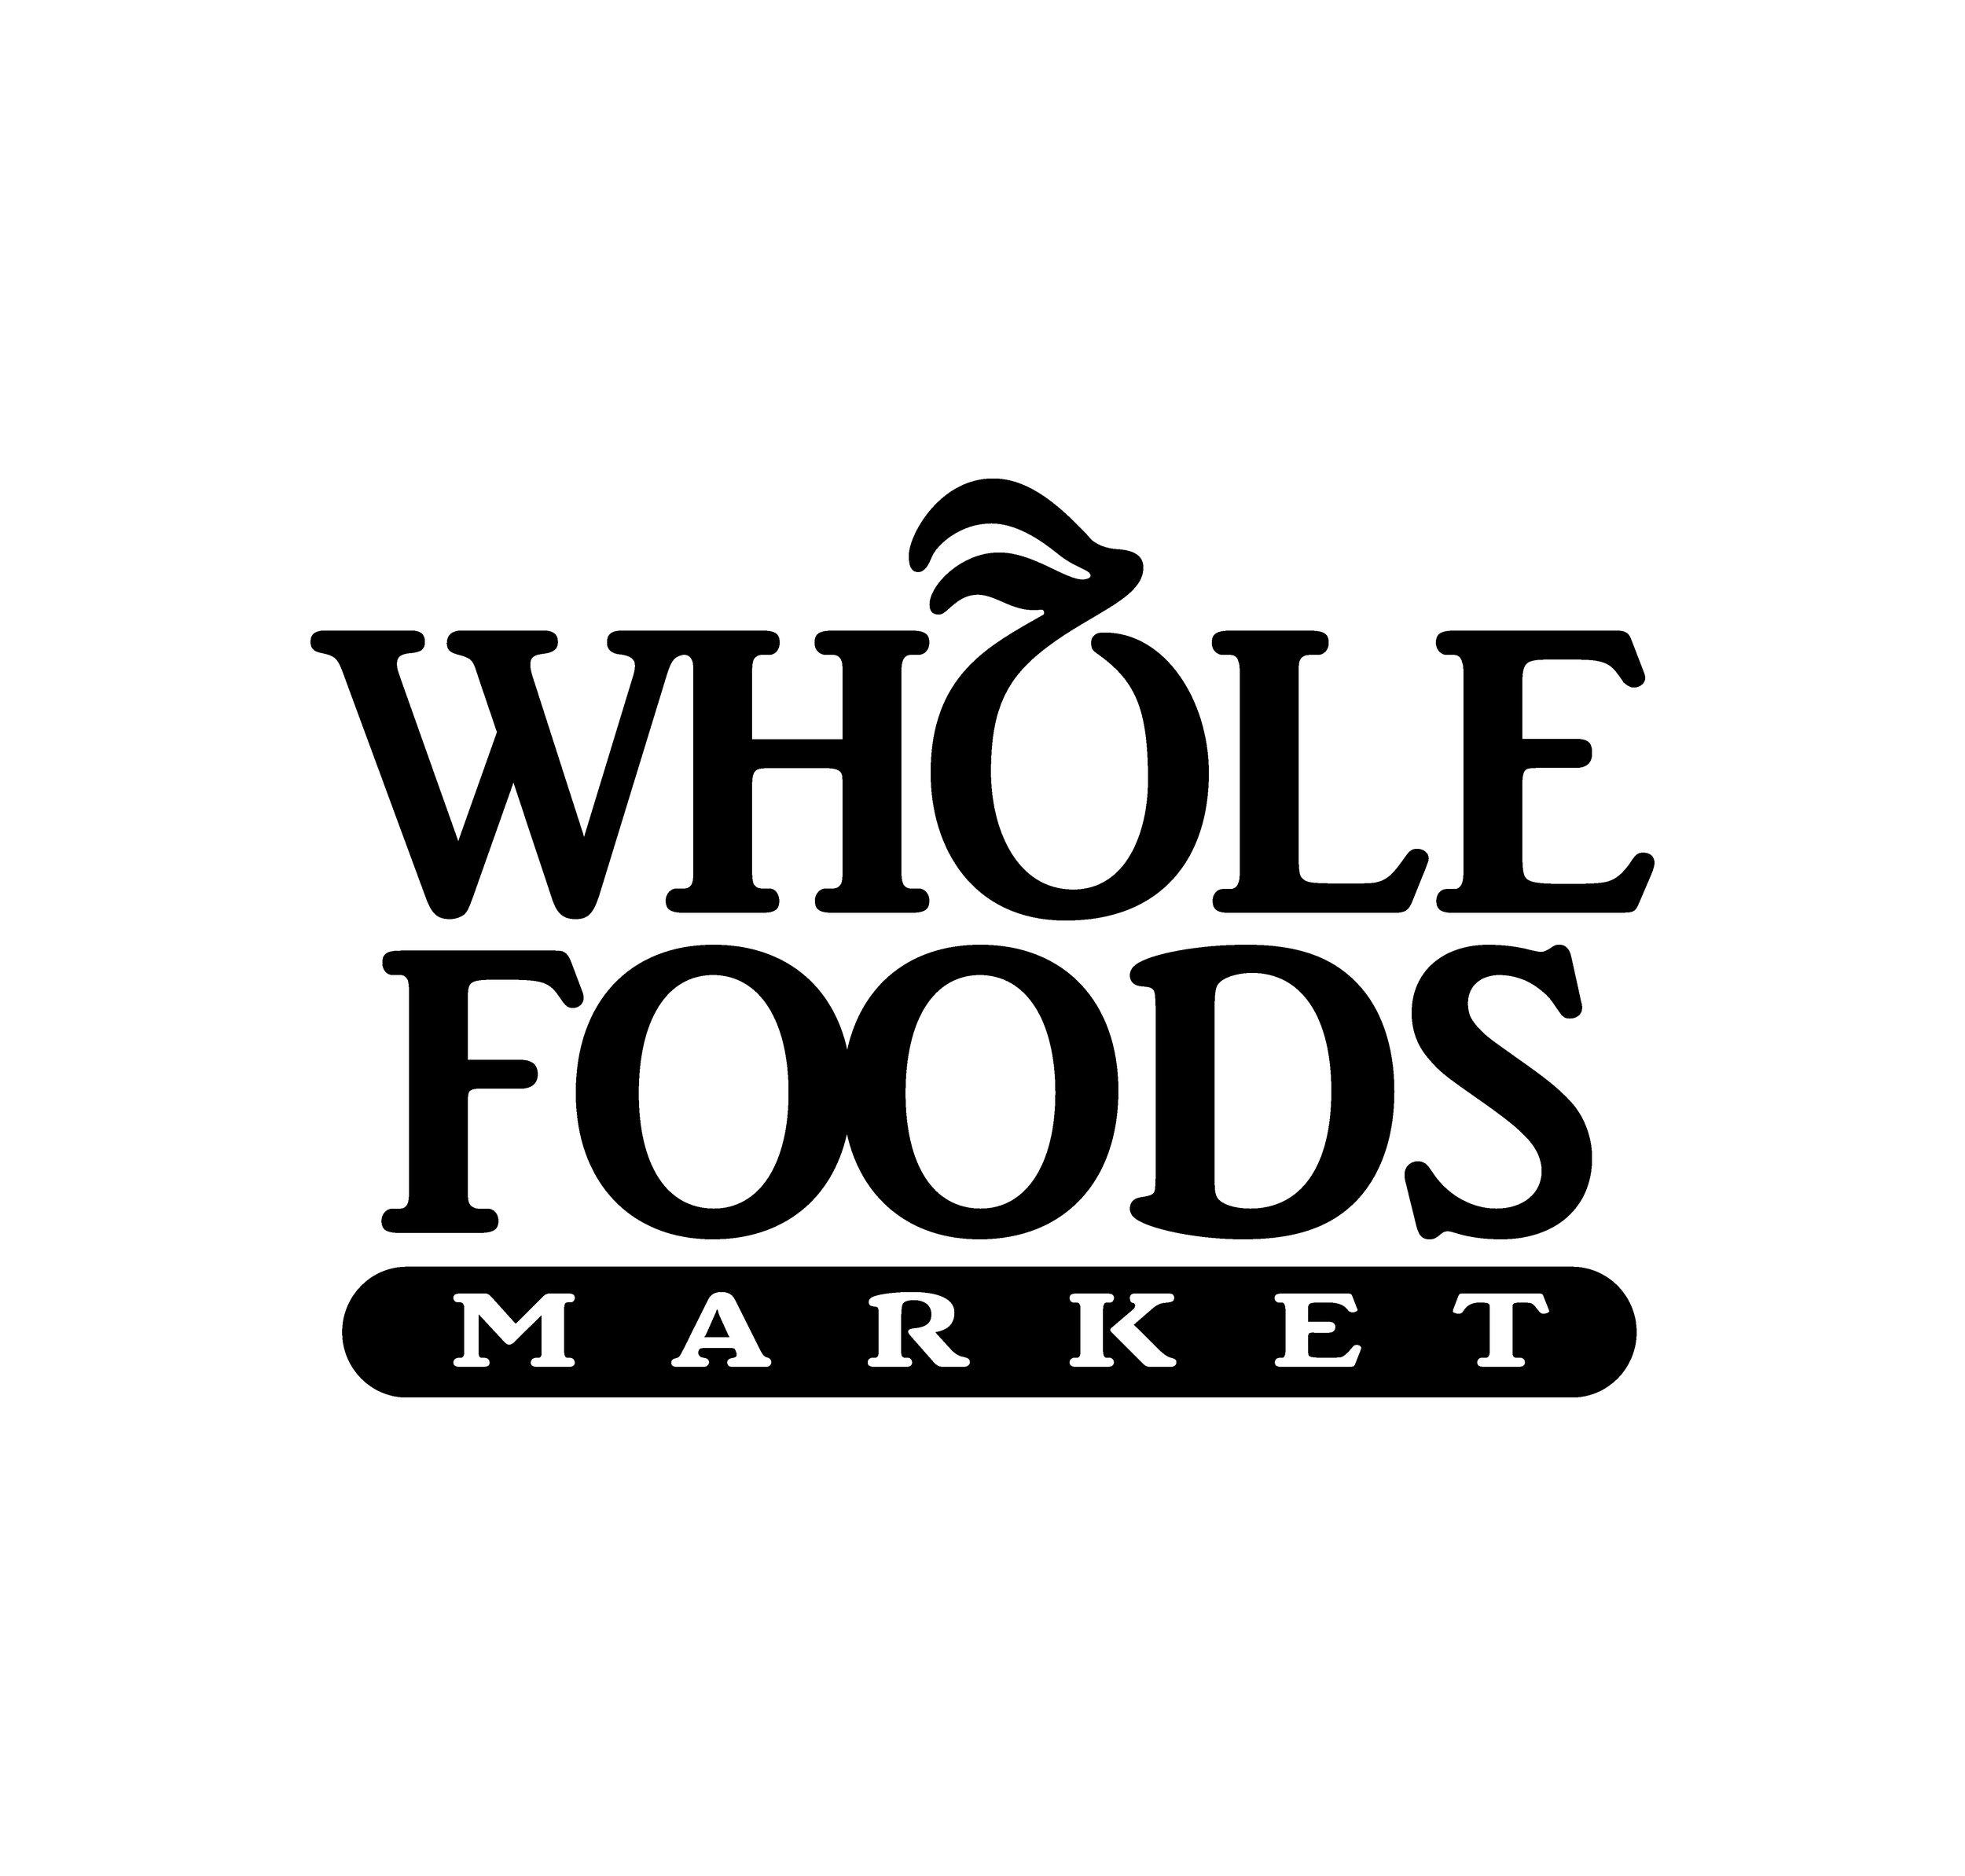 Whole_Foods_Market.jpg